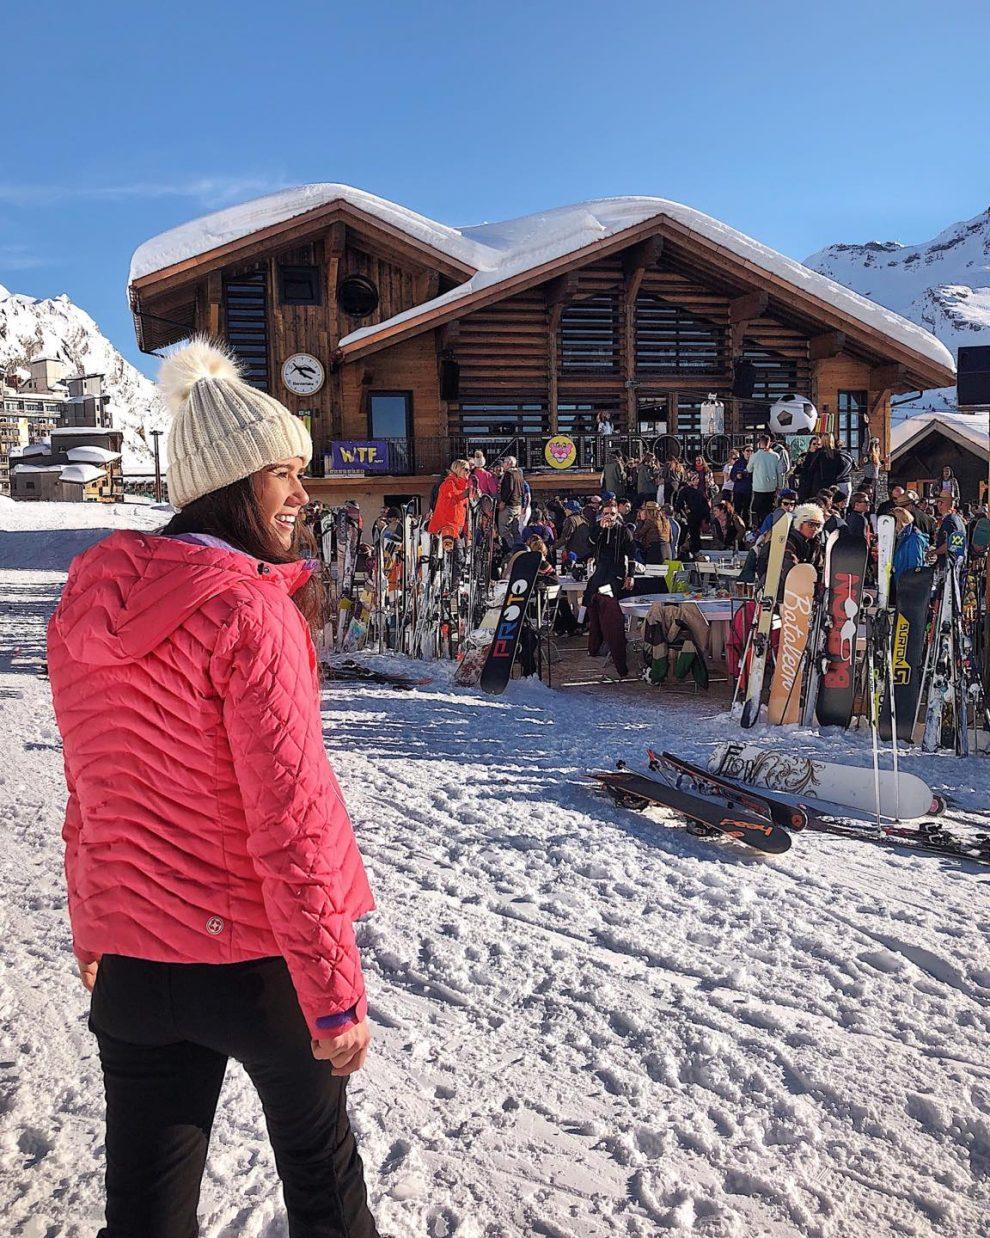 La Folie Douce hotel Chamonix - après-ski Frankrijk Avoriaz 1800